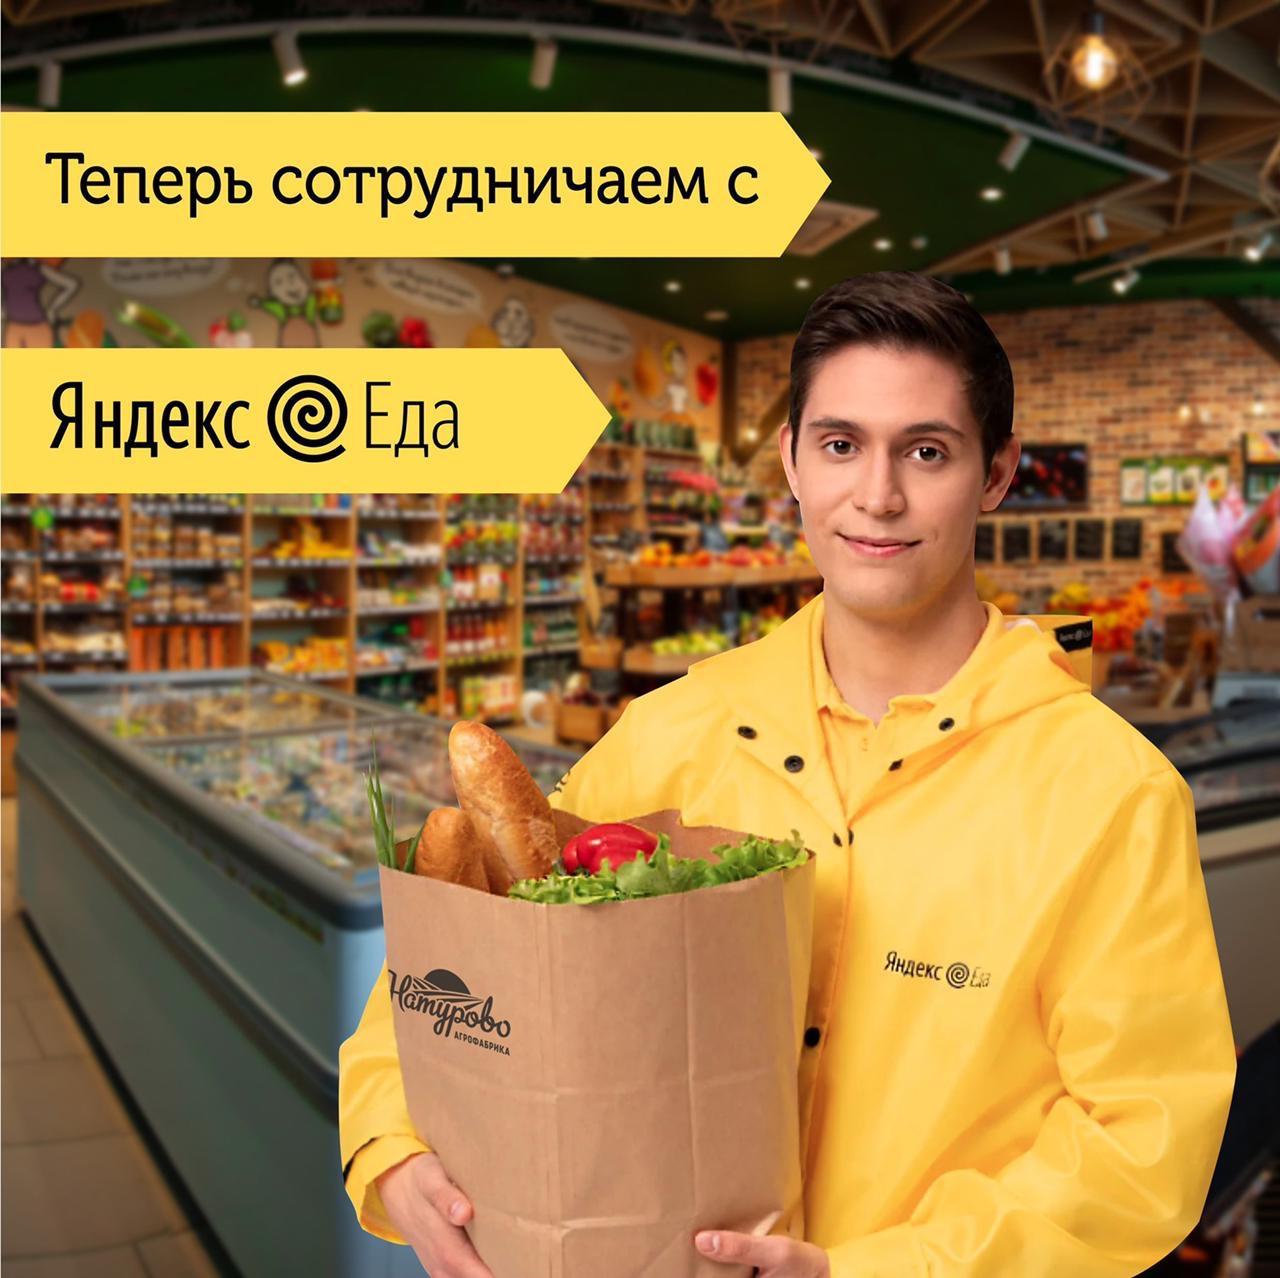 https://naturovo.ru/wp-content/uploads/2021/04/mobile_file_2021-04-08_13-58-09.jpg